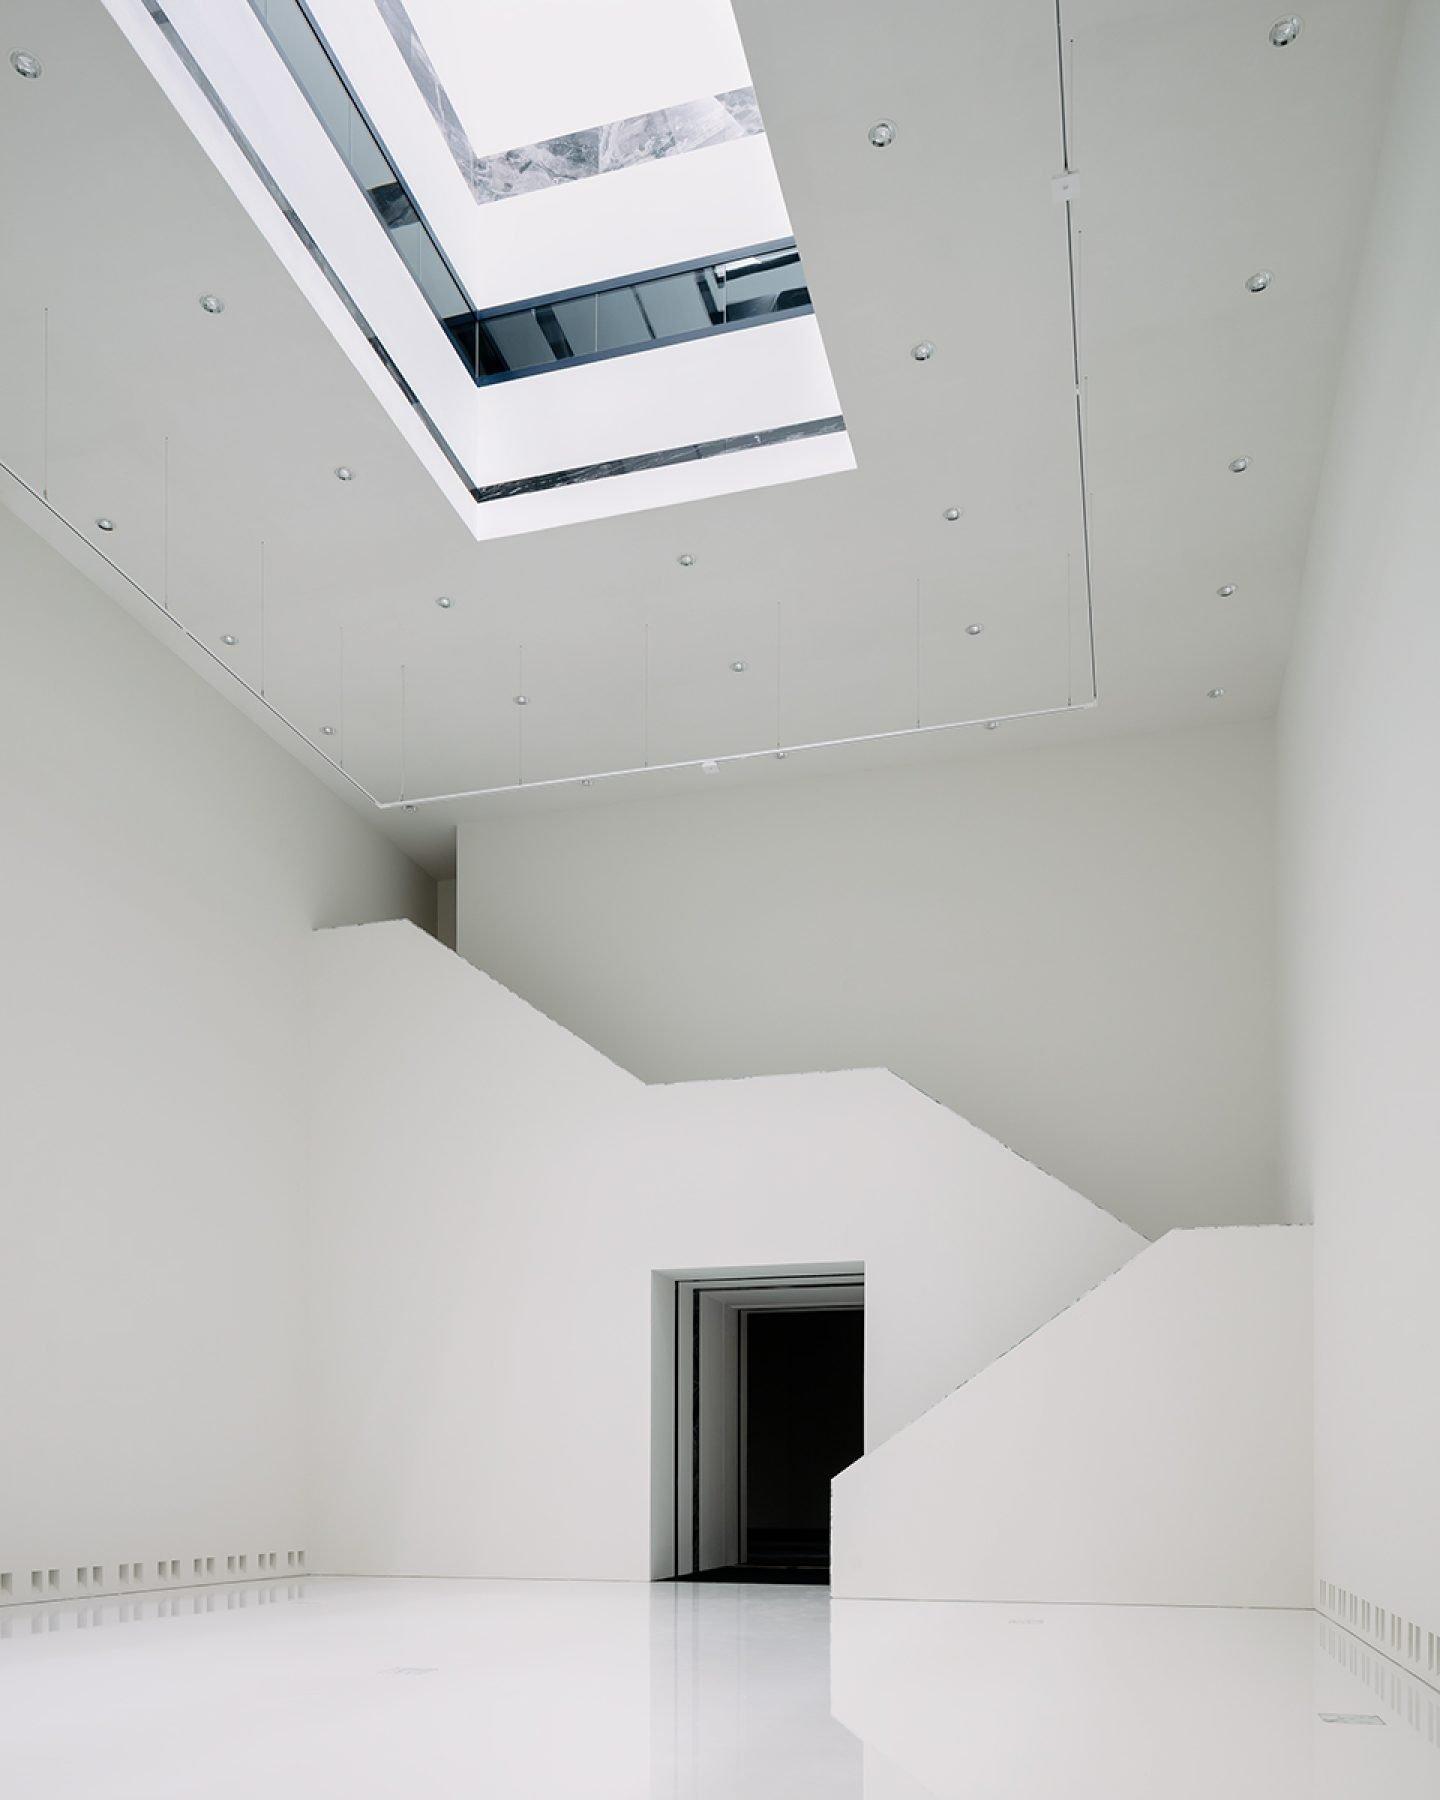 IGNANT-Travel-Kaan-Architekten-KMSKA-010